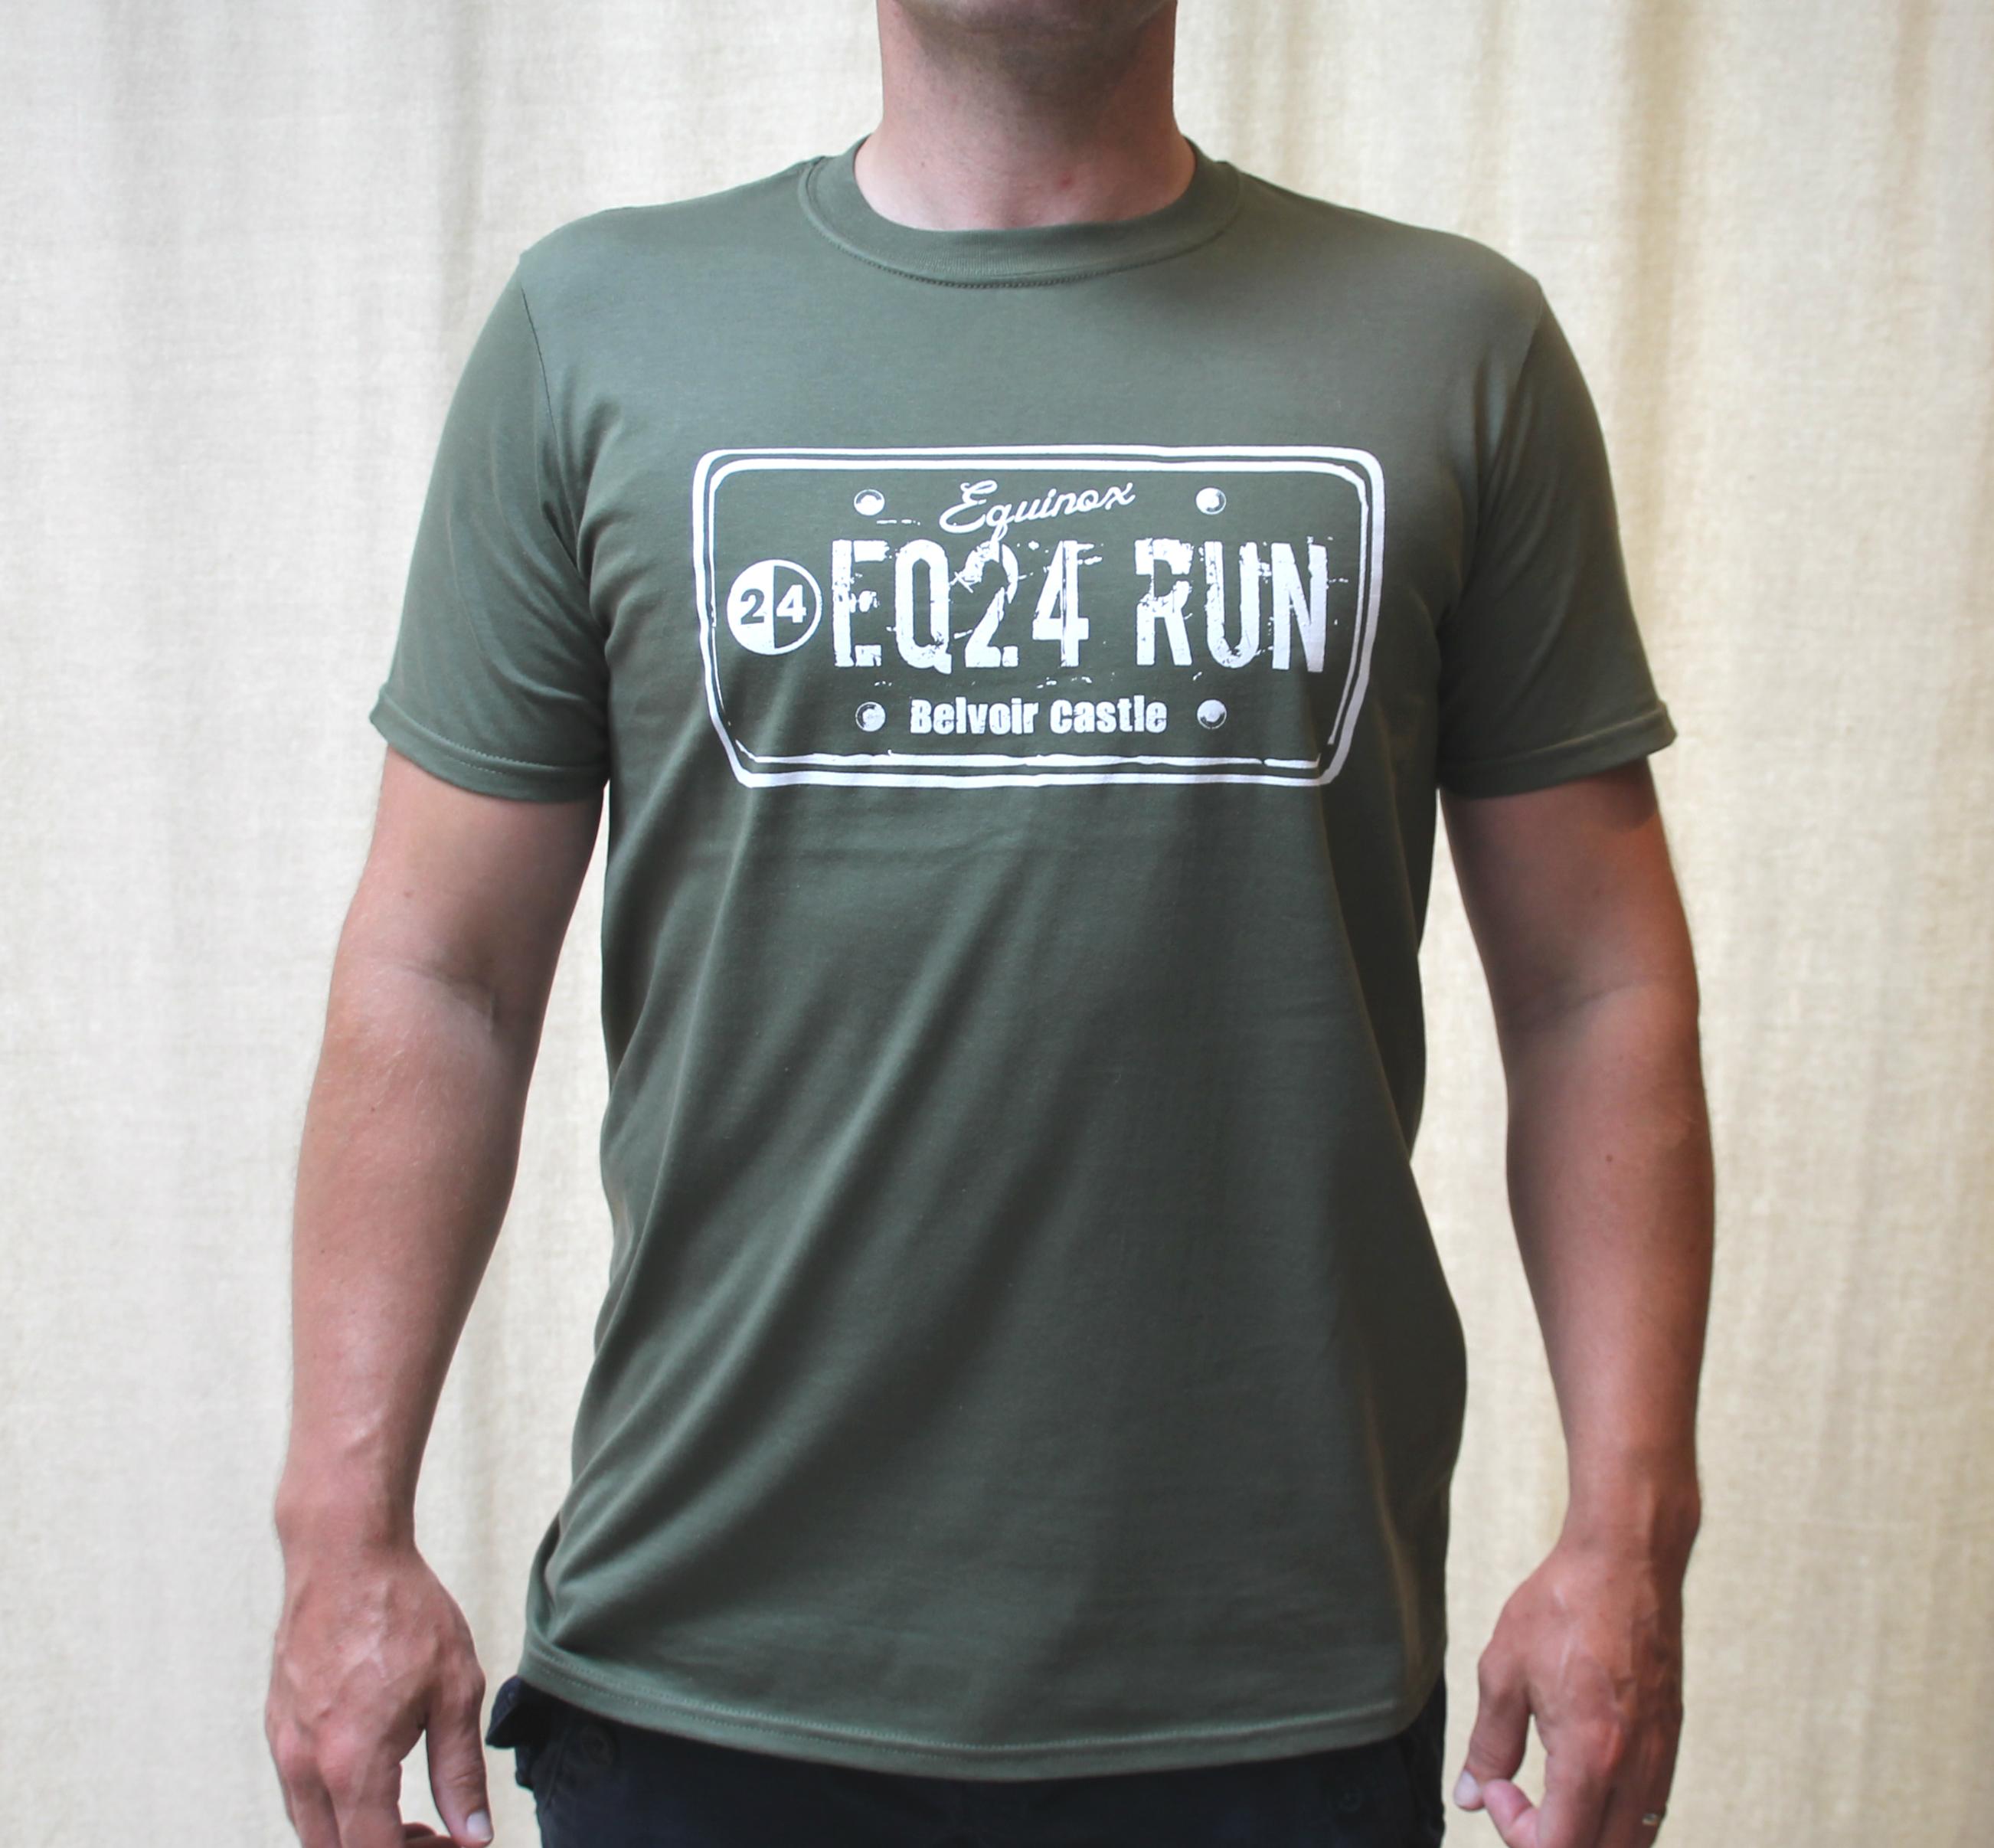 Eq24 run license plate cotton t shirt equinox24 for T shirt licensing agreement